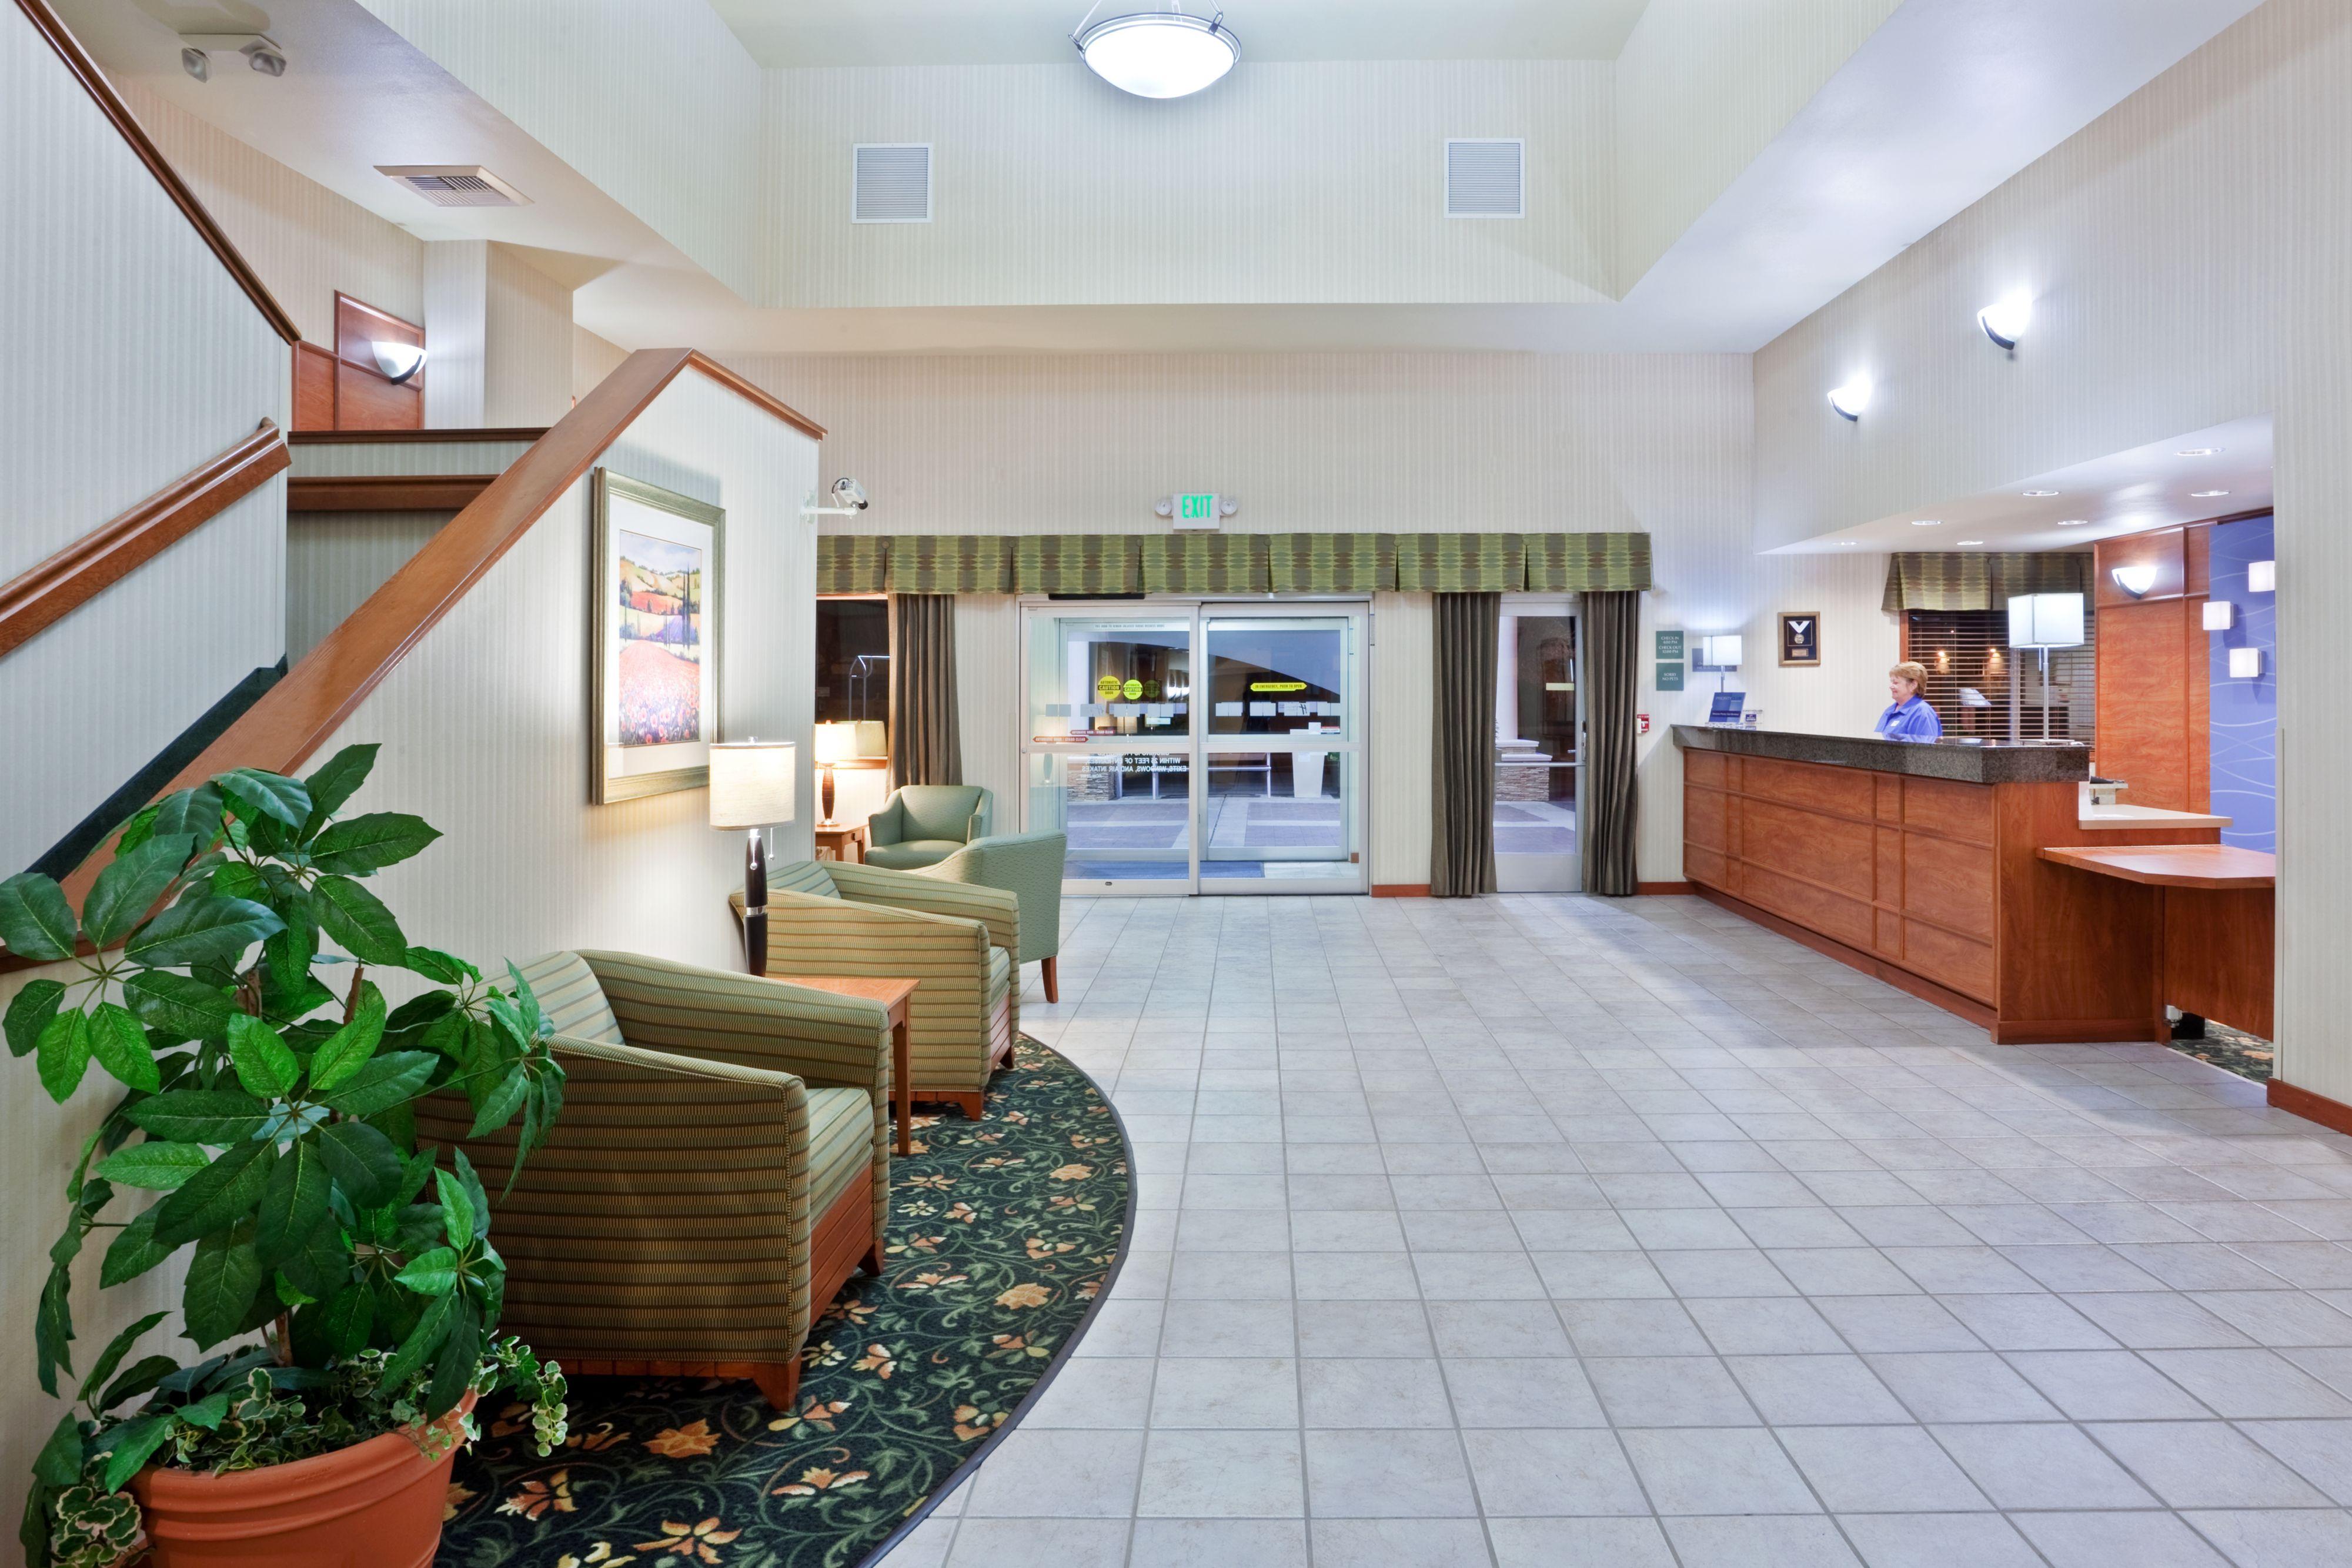 Holiday Inn Express & Suites Burlington image 7